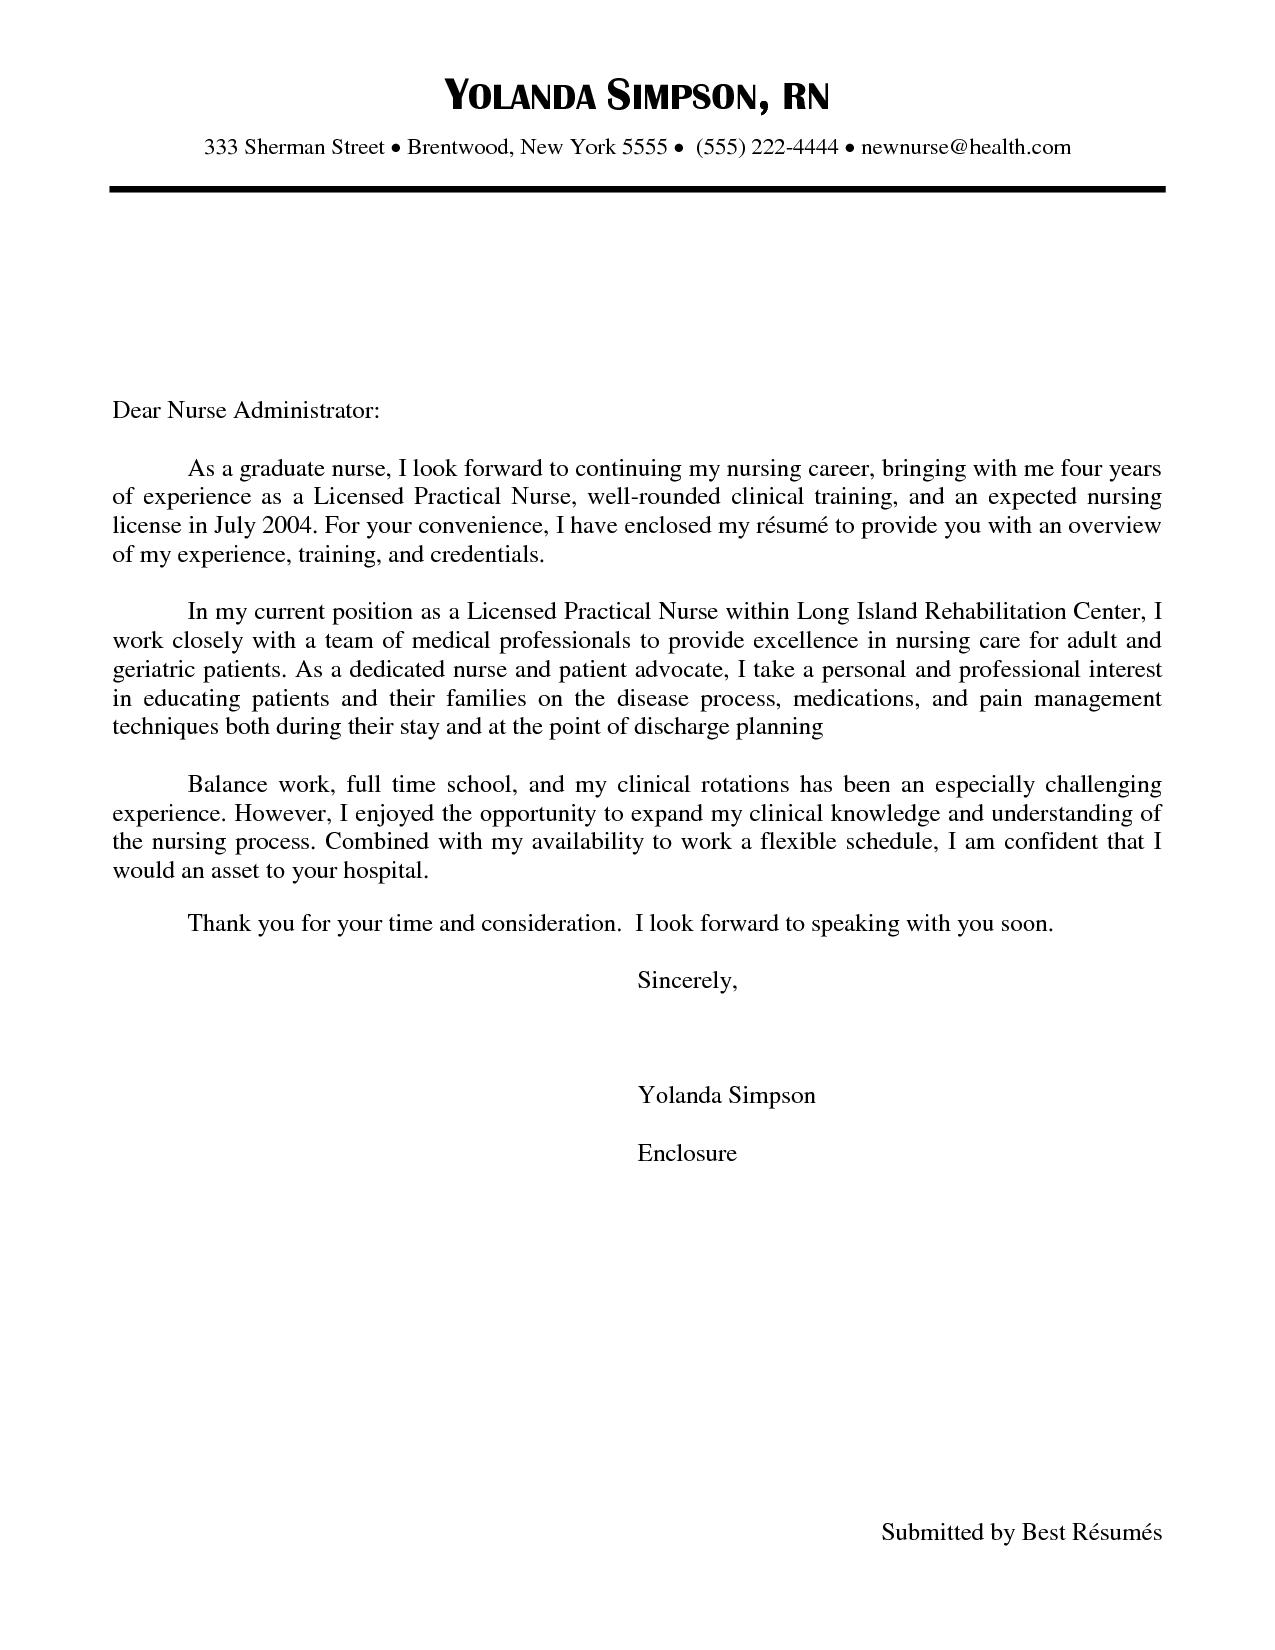 Cover Letter Template Nursing Graduate